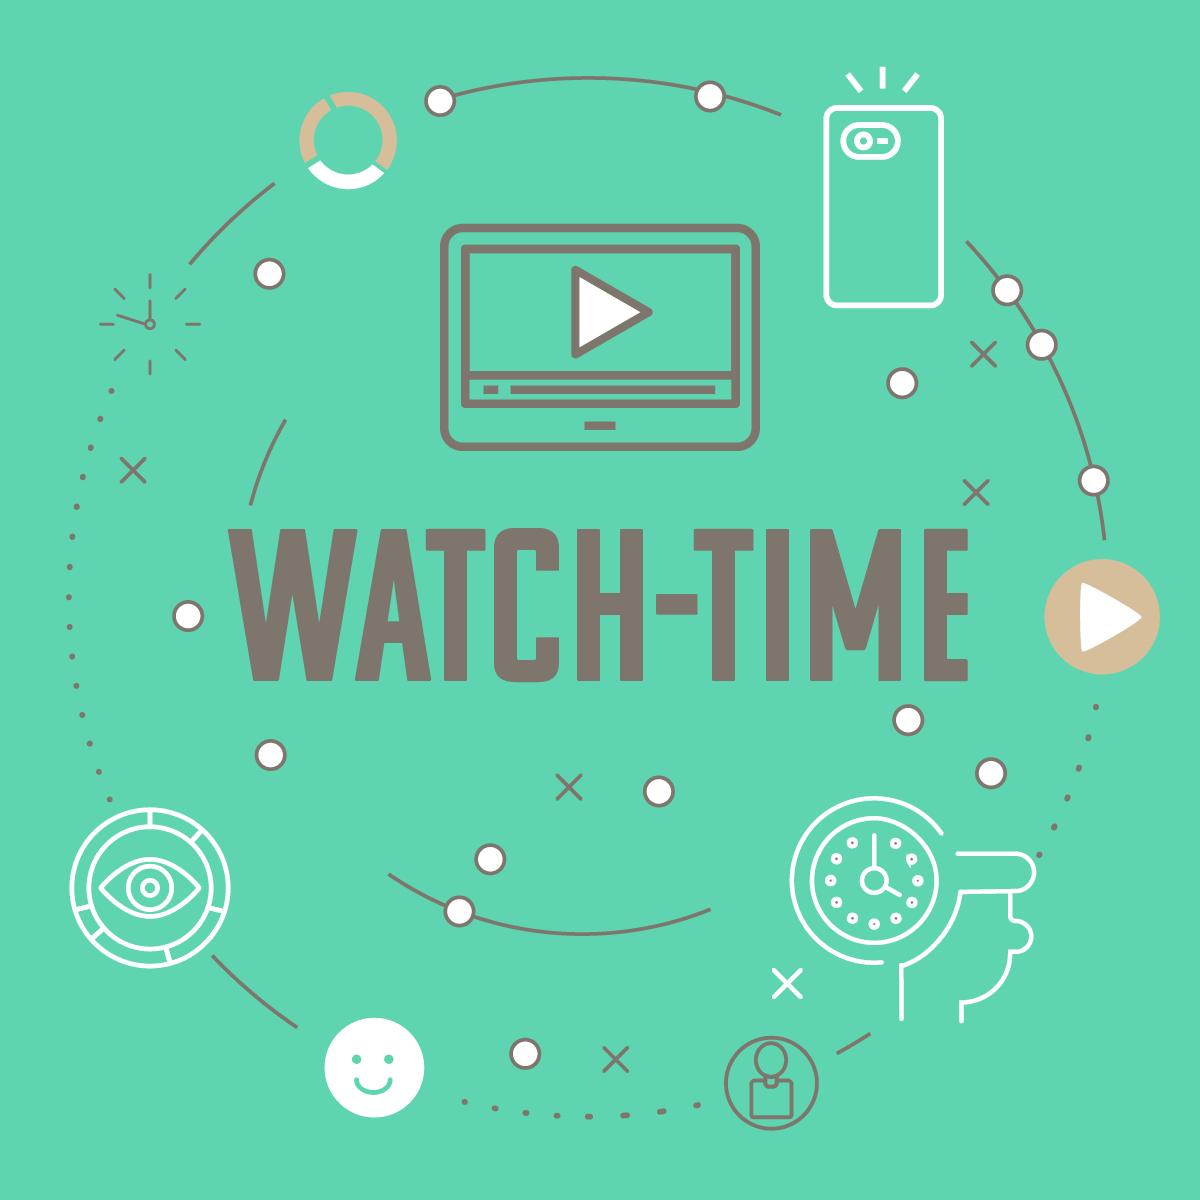 Watch-time.jpg